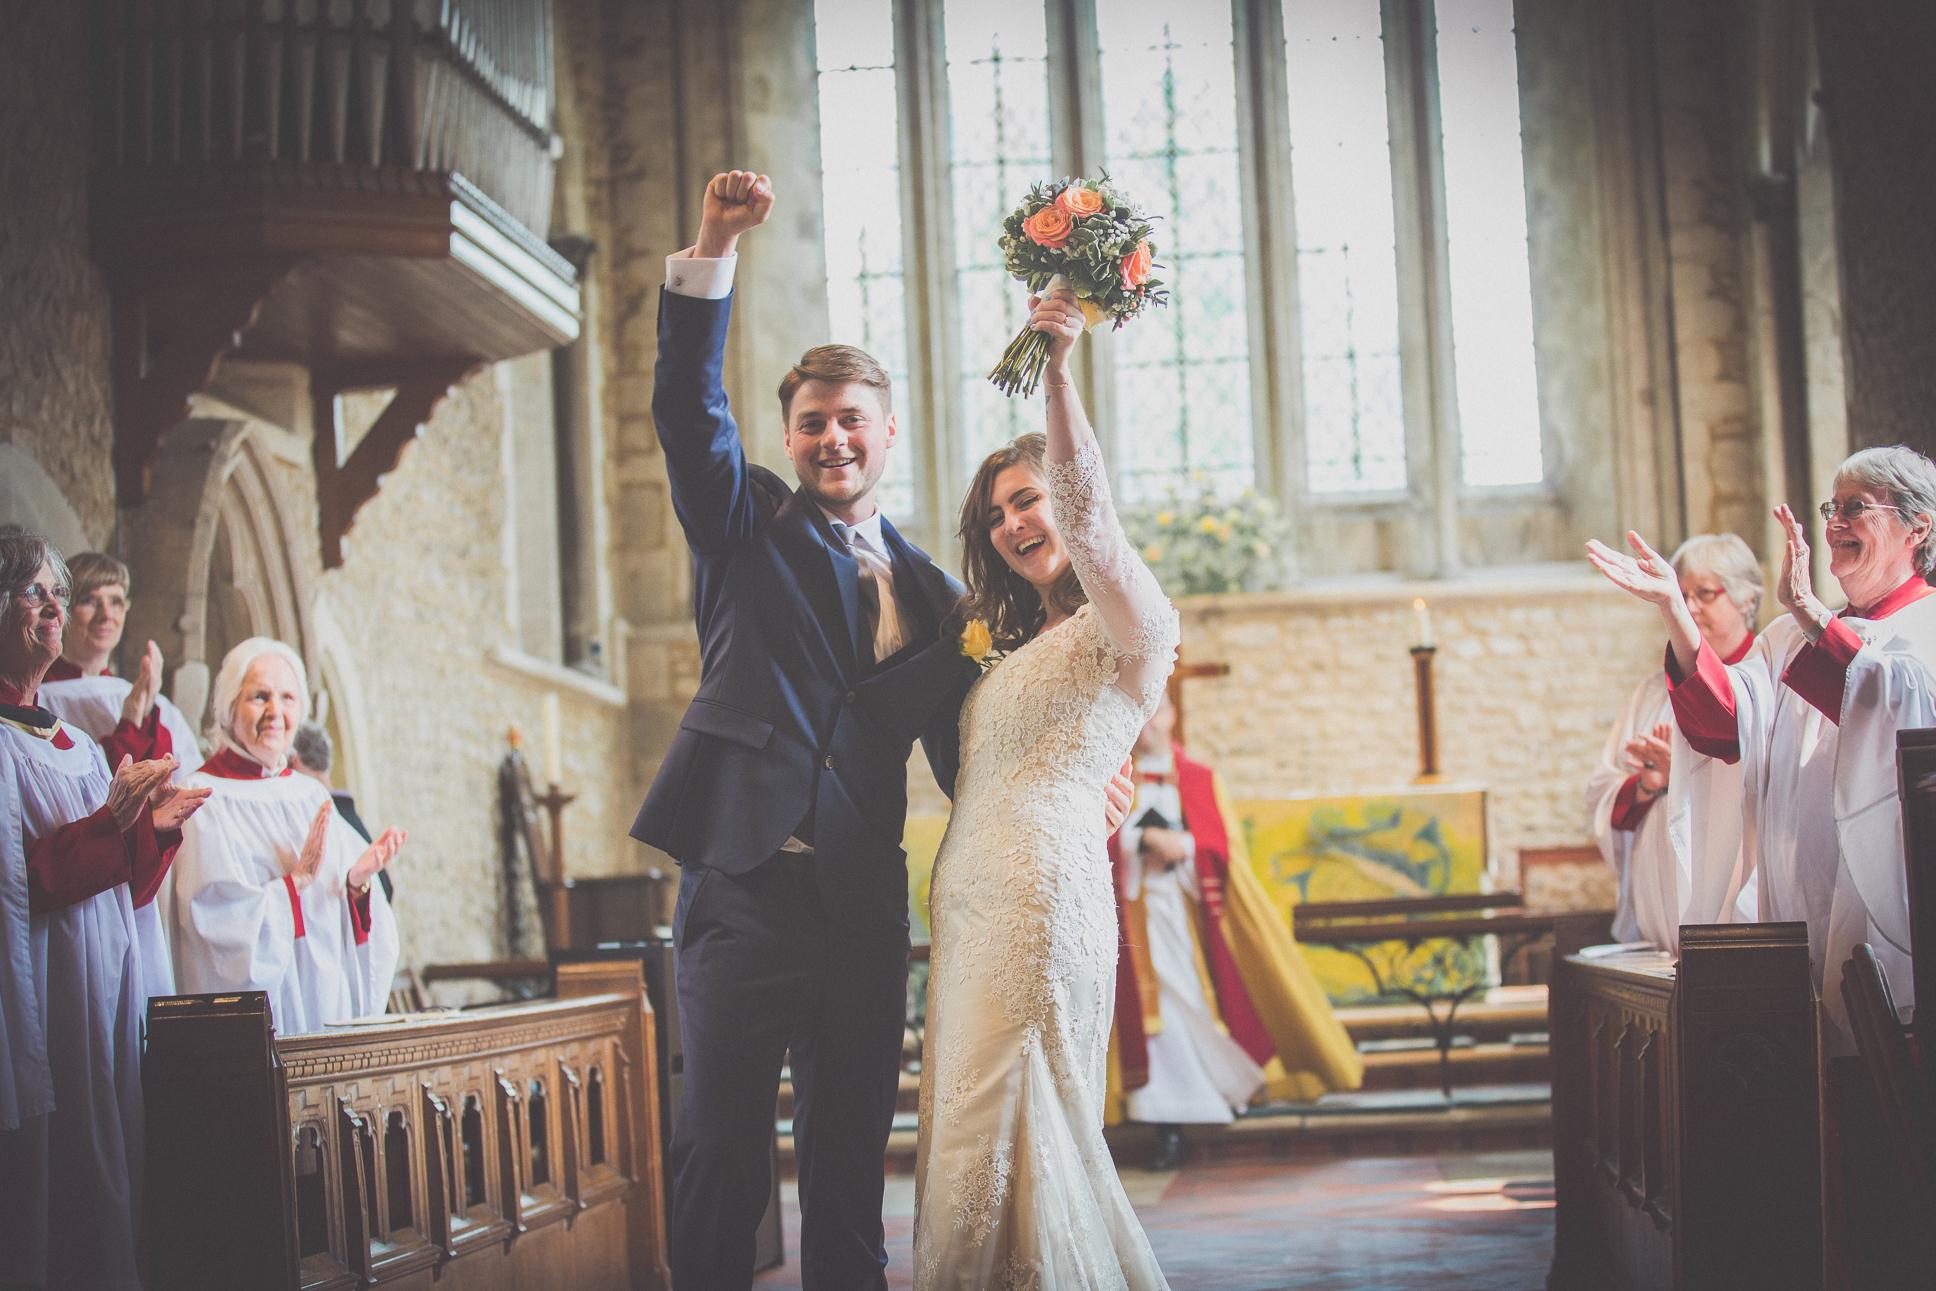 east church wedding east sussex.jpg